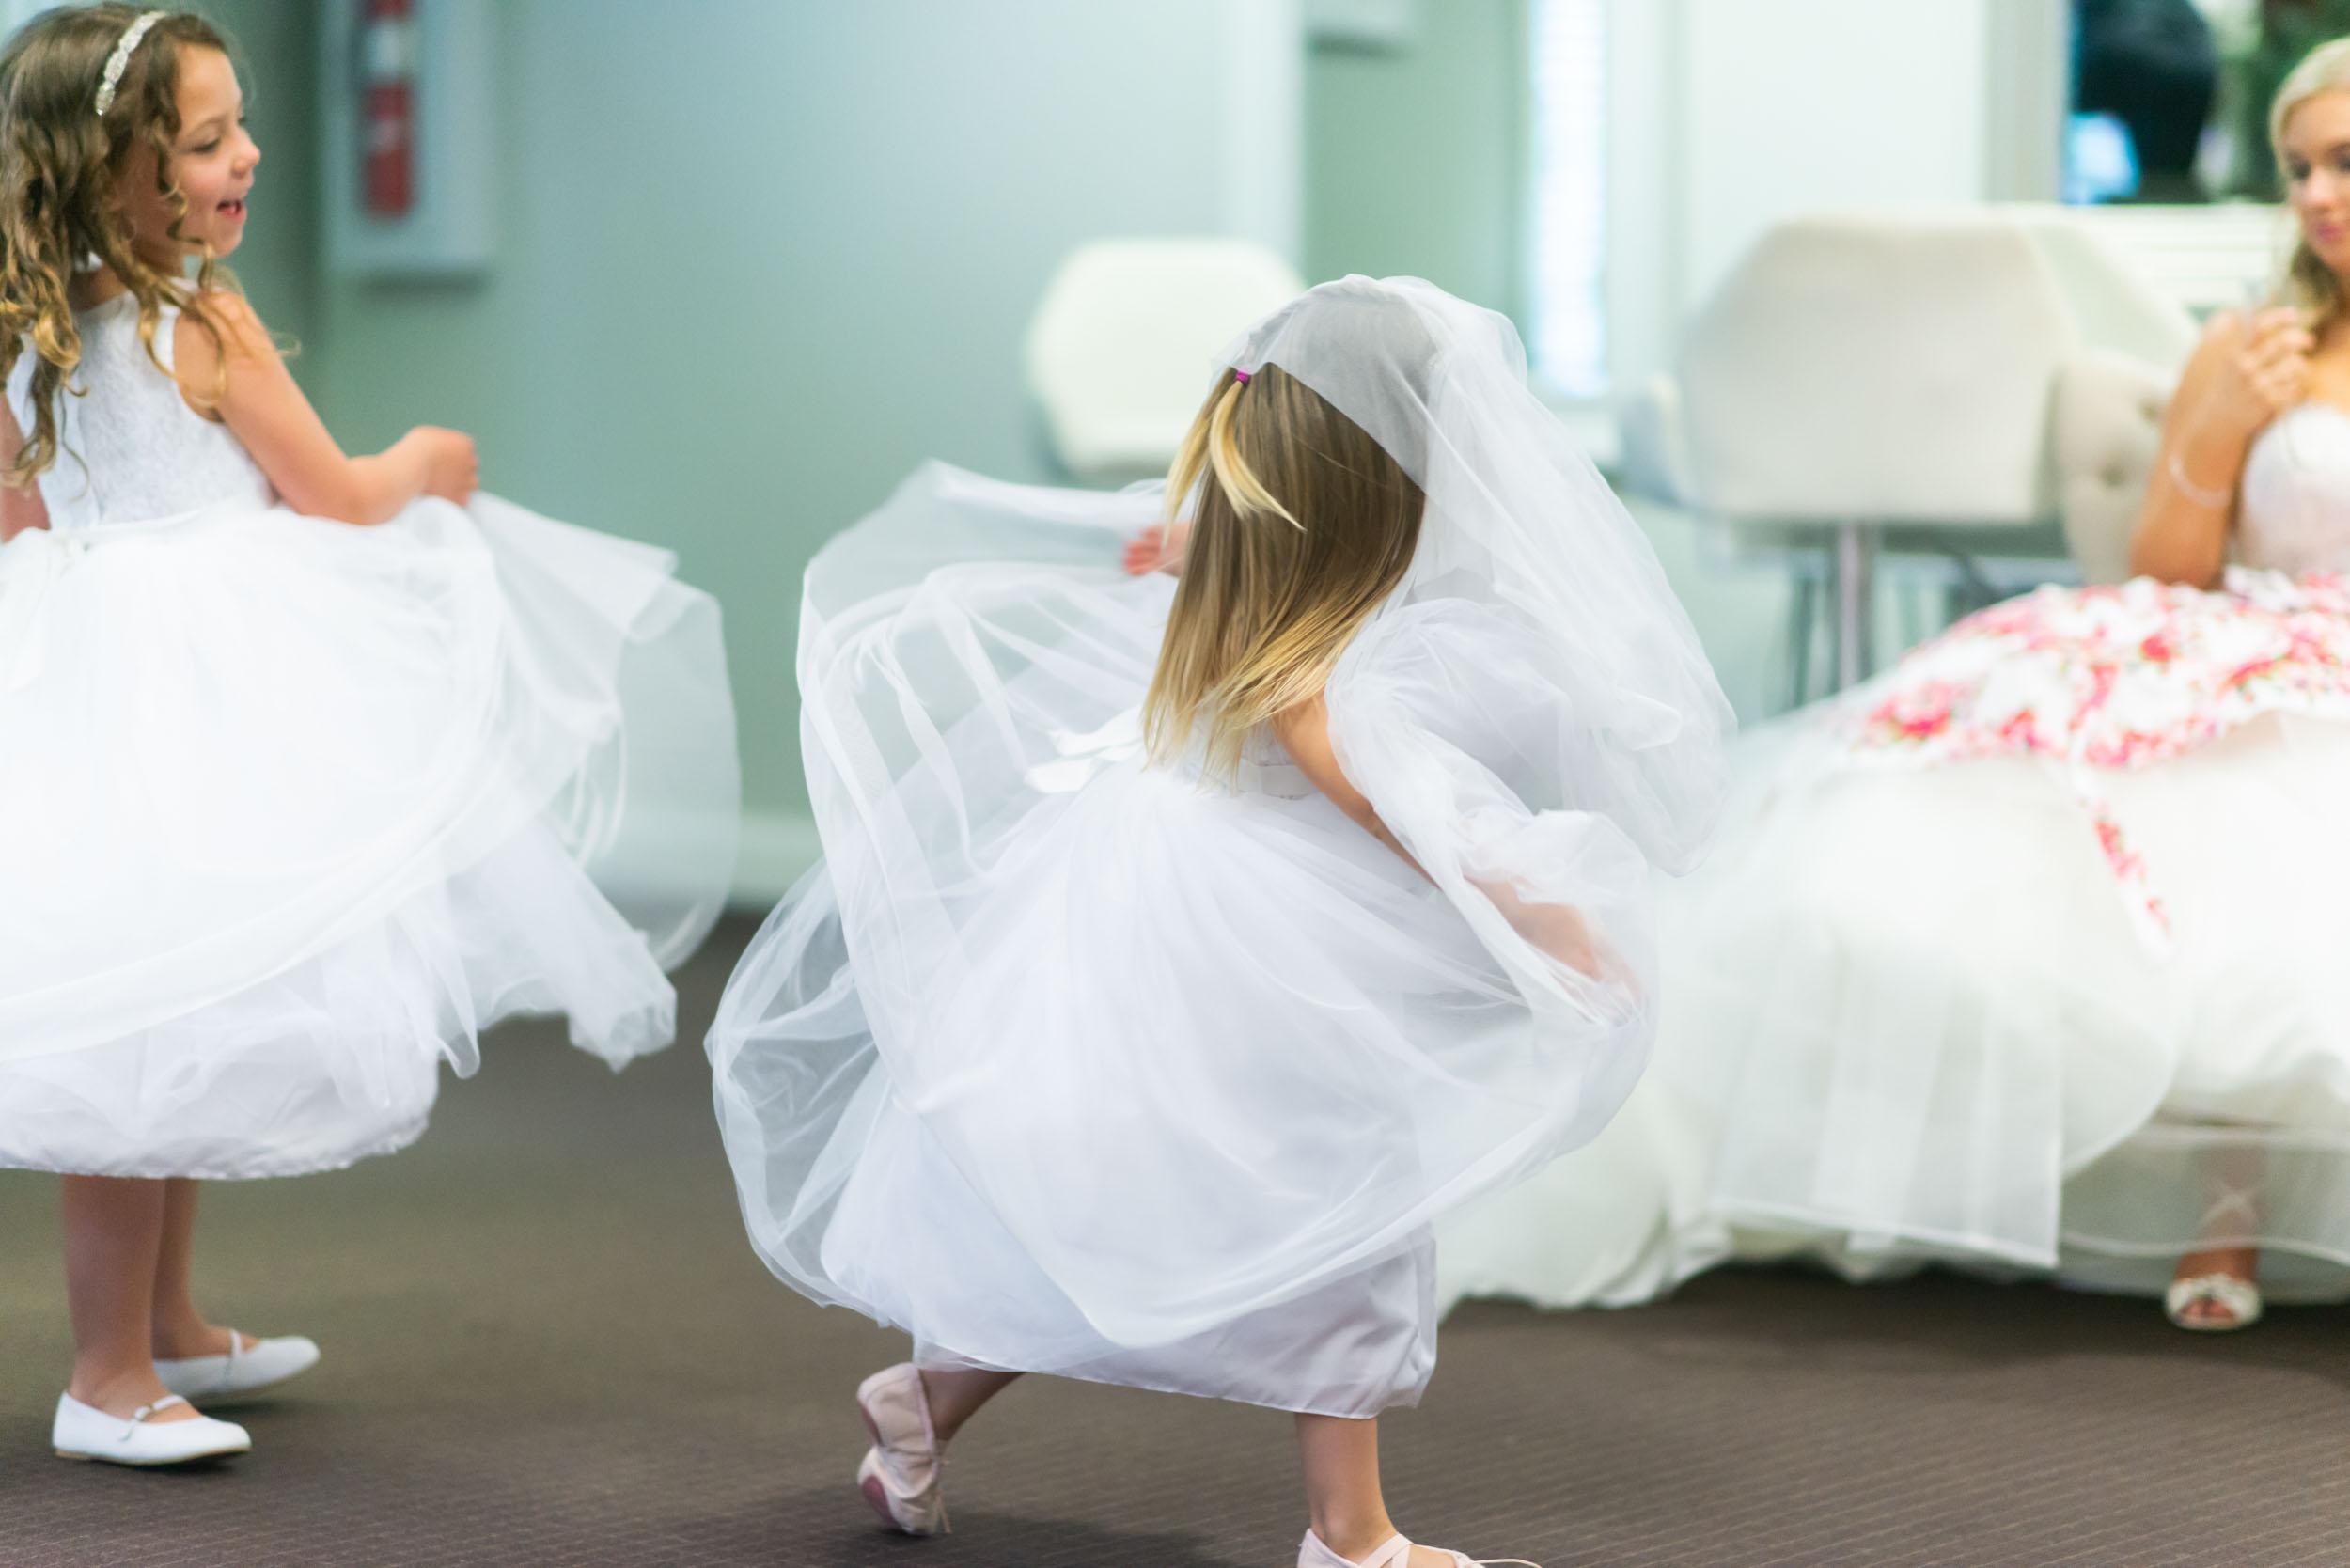 dc+metro+wedding+photographer+vadym+guliuk+photography+weddings-2025-2.jpg